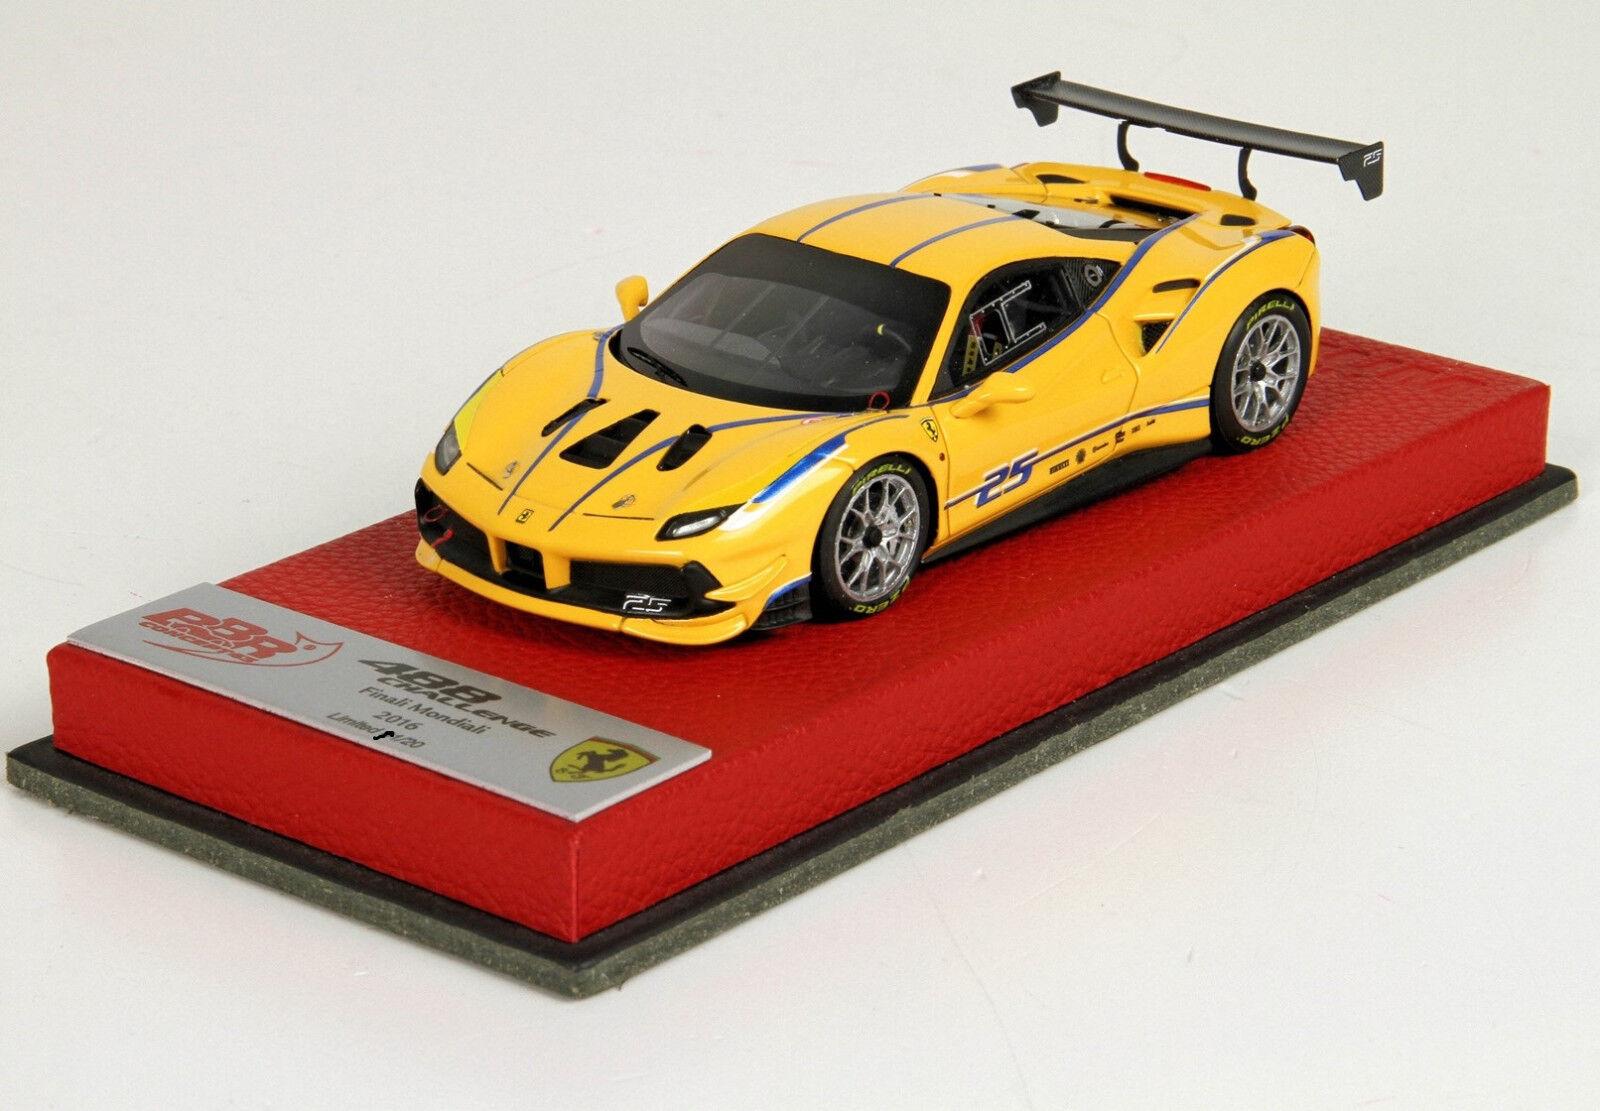 Ferrari 488 Challenge Finali Mondiali Mondiali Mondiali 2016  1 43 lim.ed. 20 pcs BBRC197APRE BBR 79f6d9